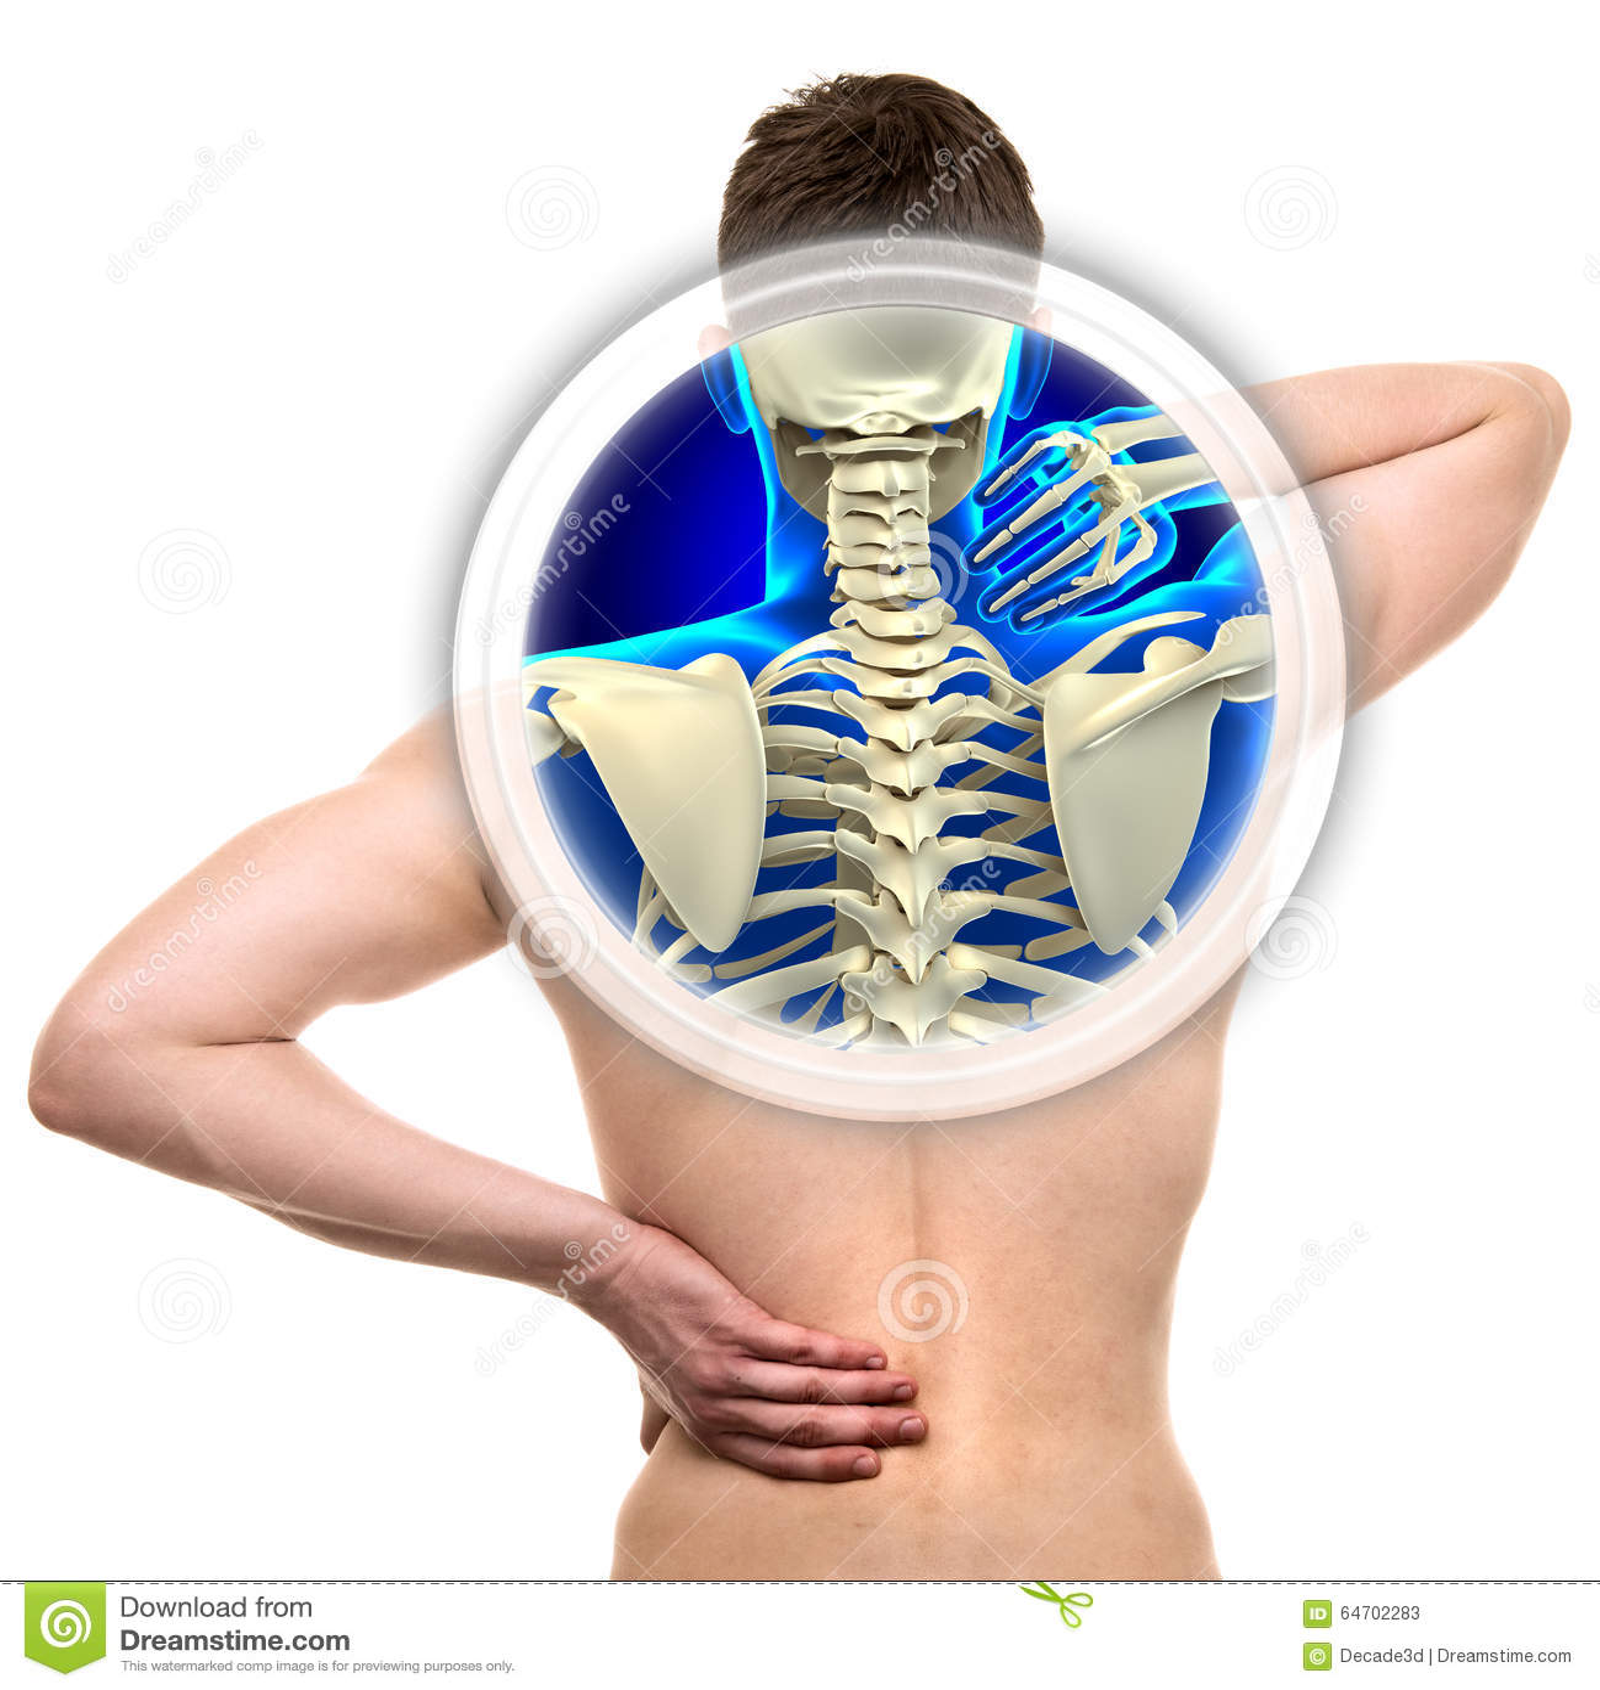 Increíble Anatomía Espina Dorsal De Rata Imagen - Imágenes de ...